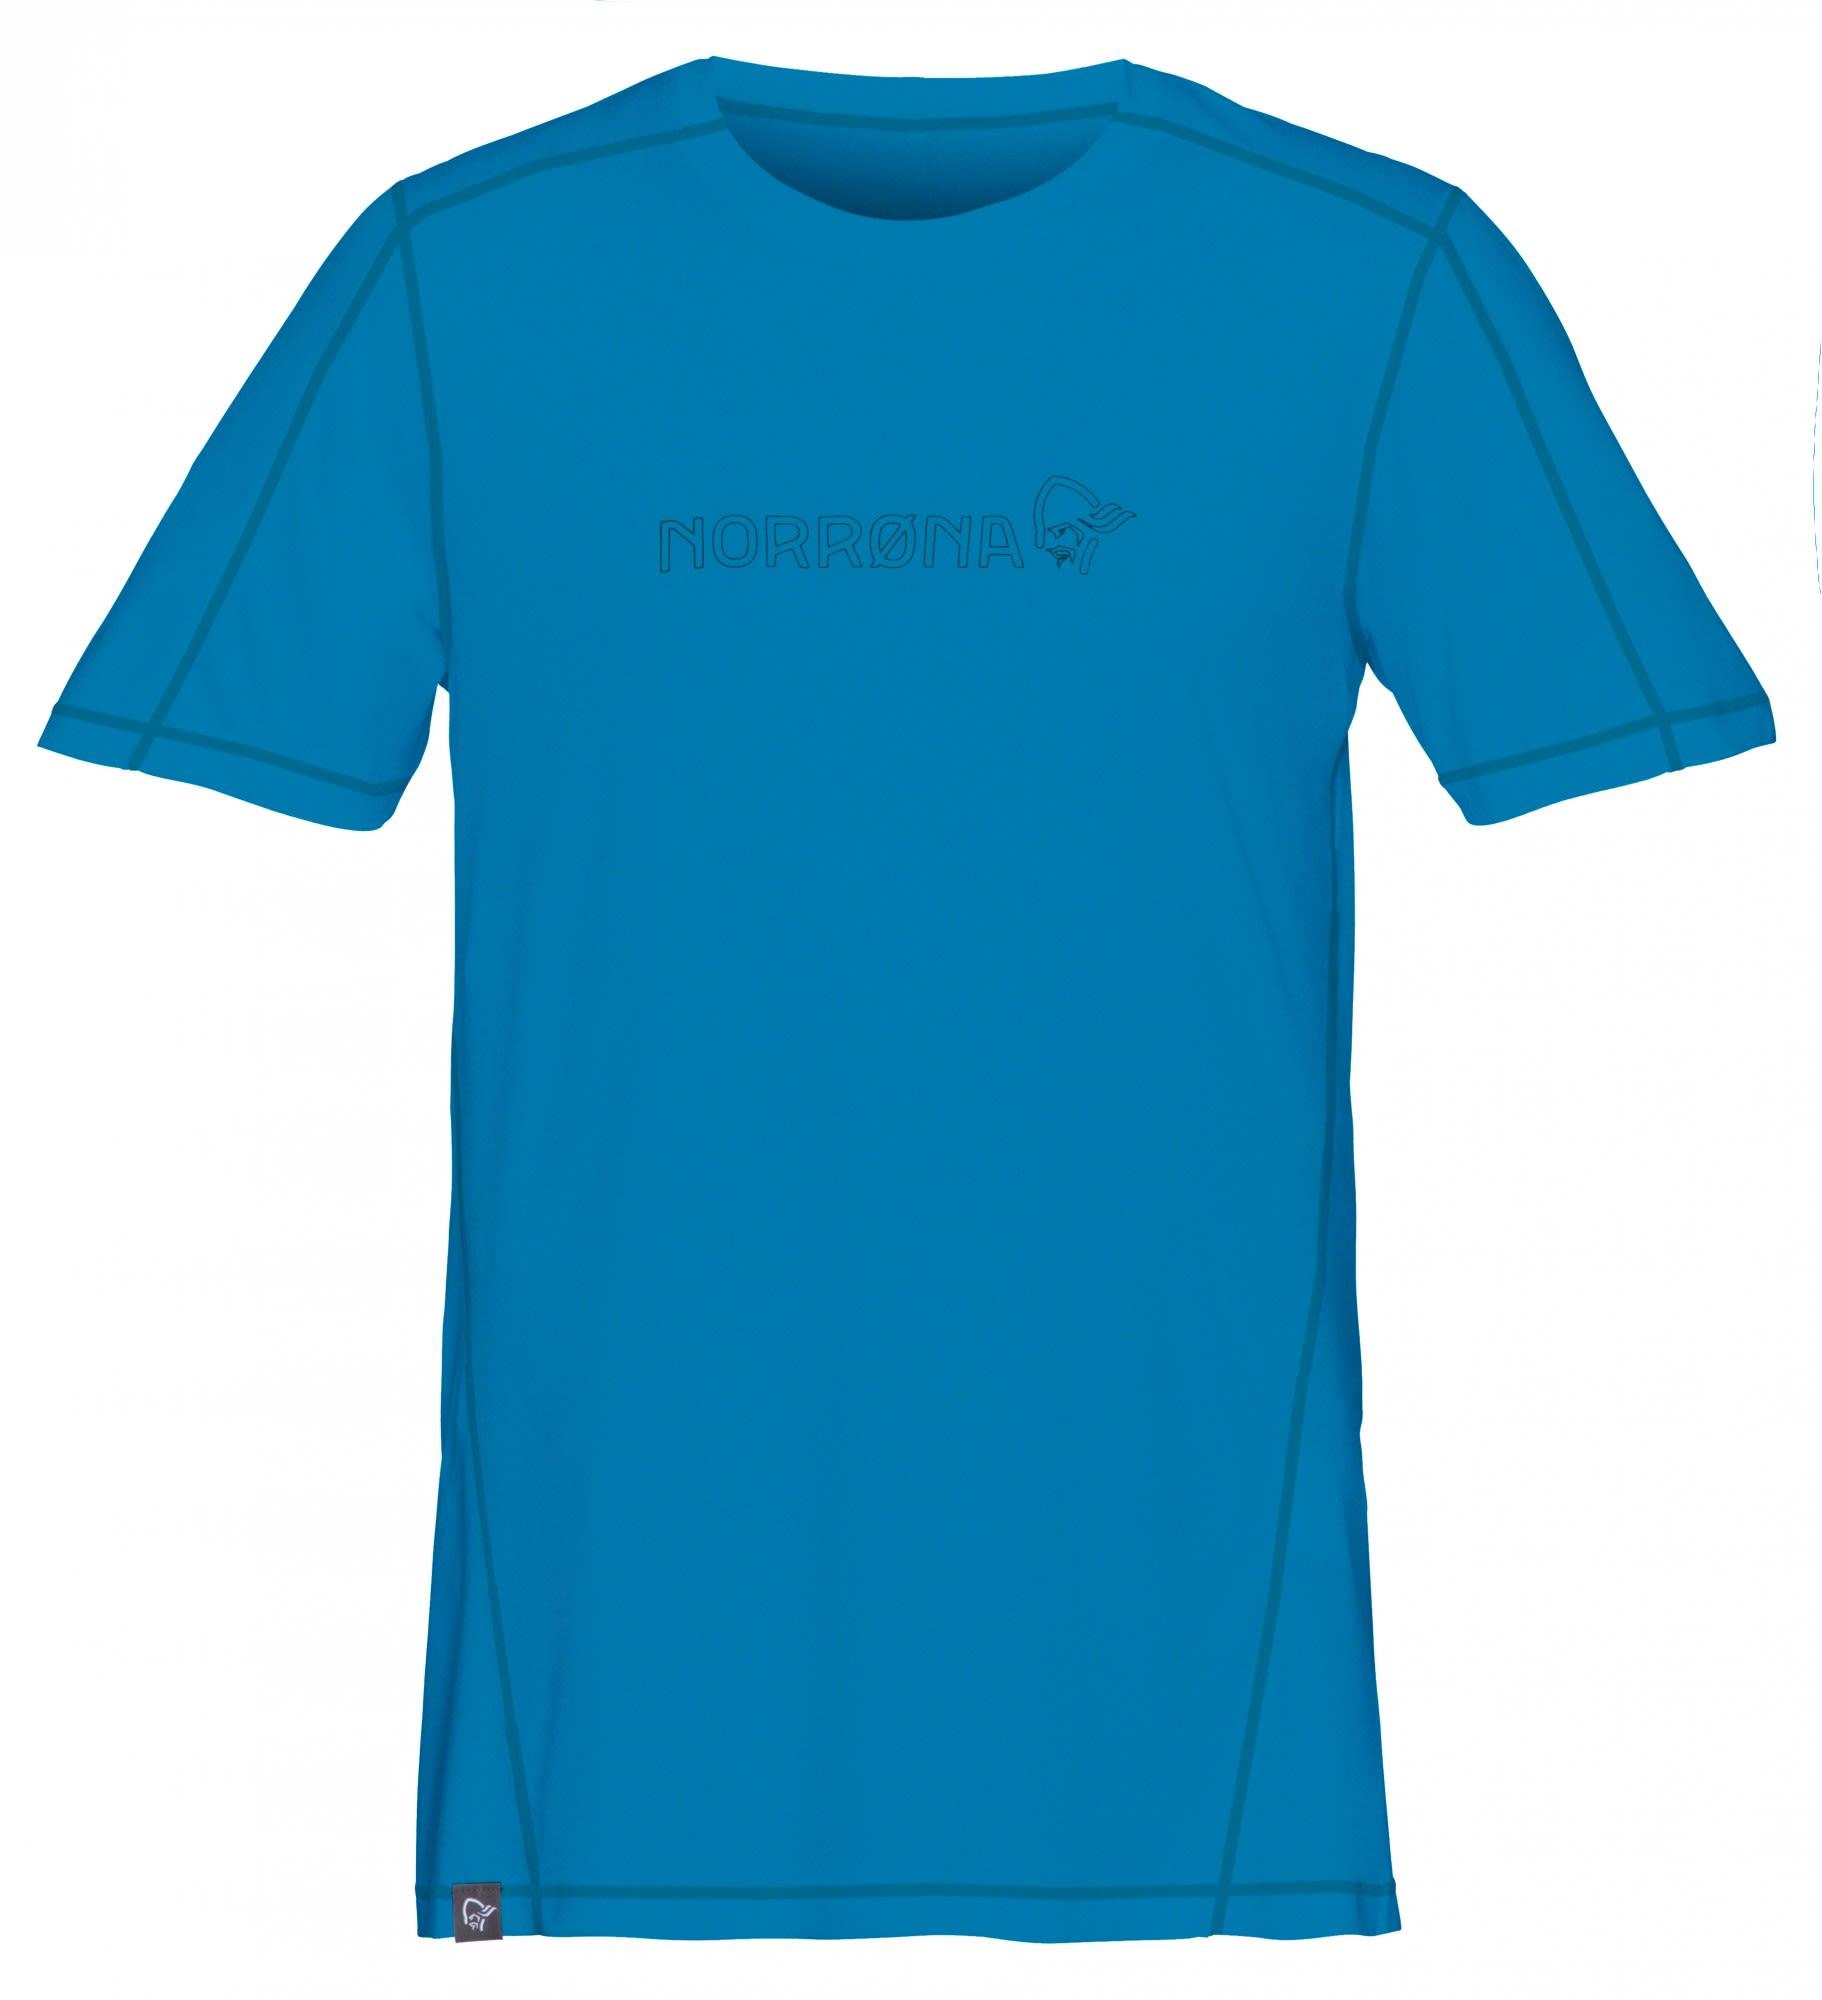 Norrona /29 Tech T-Shirt Blau, Male Kurzarm-Shirt, M